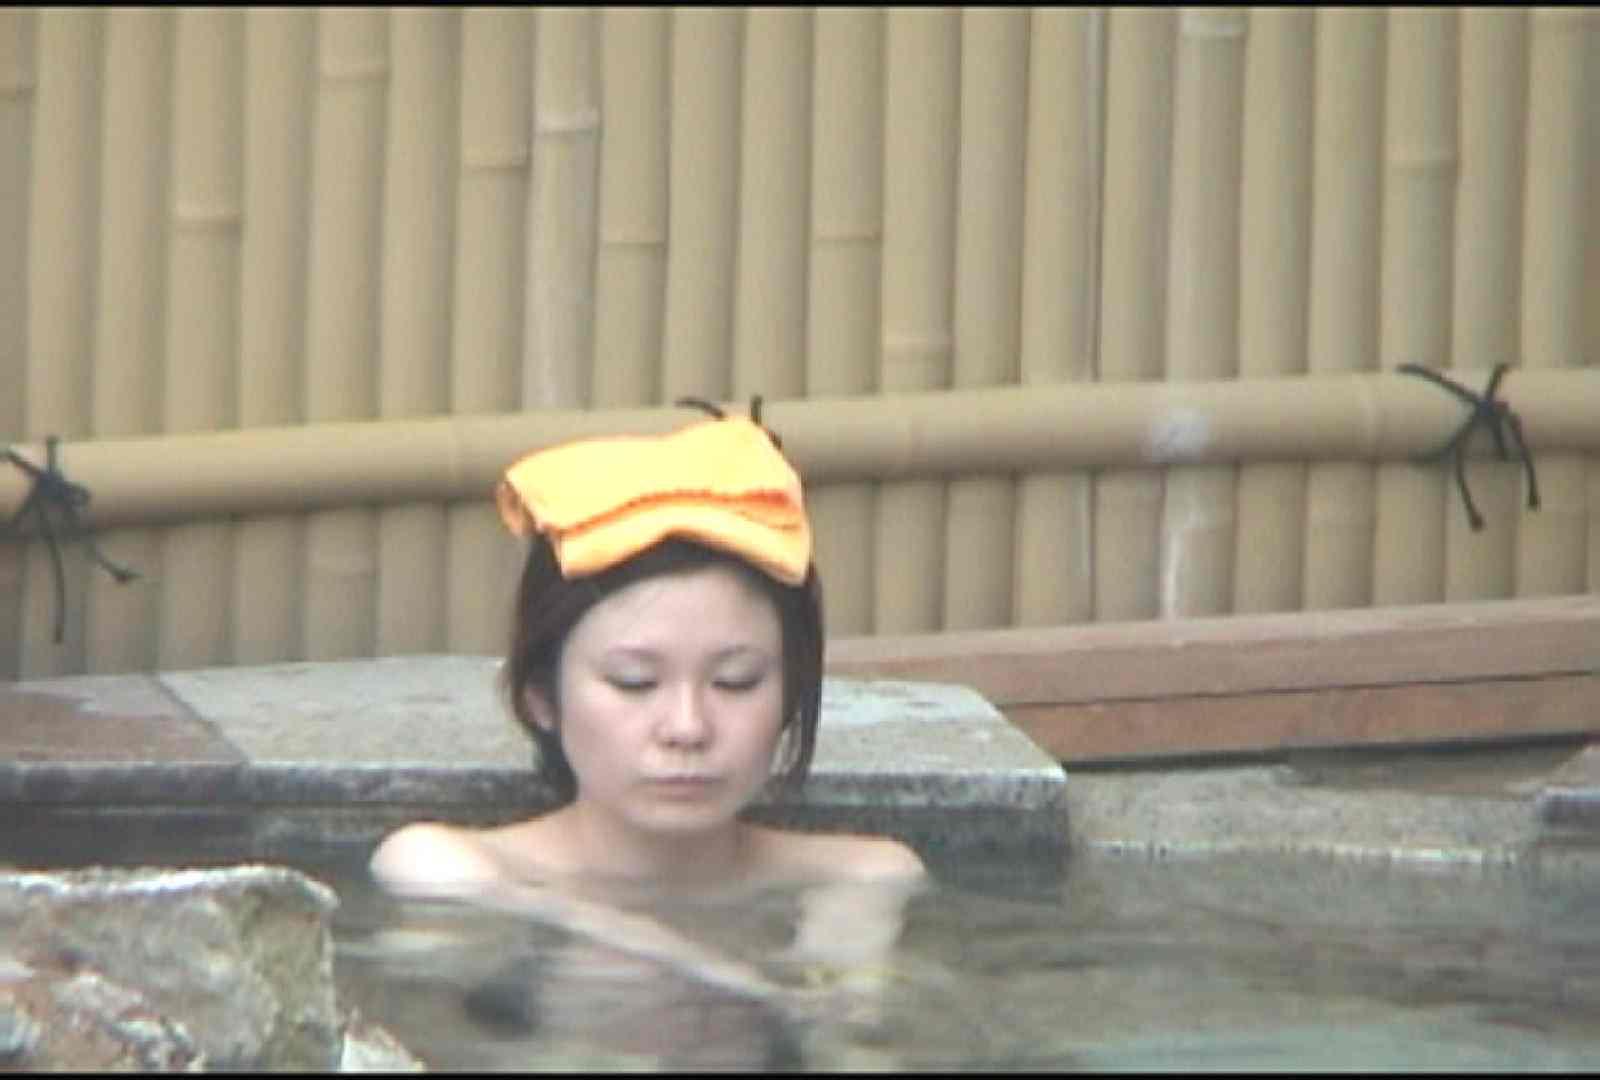 Aquaな露天風呂Vol.177 盗撮師作品  102pic 6